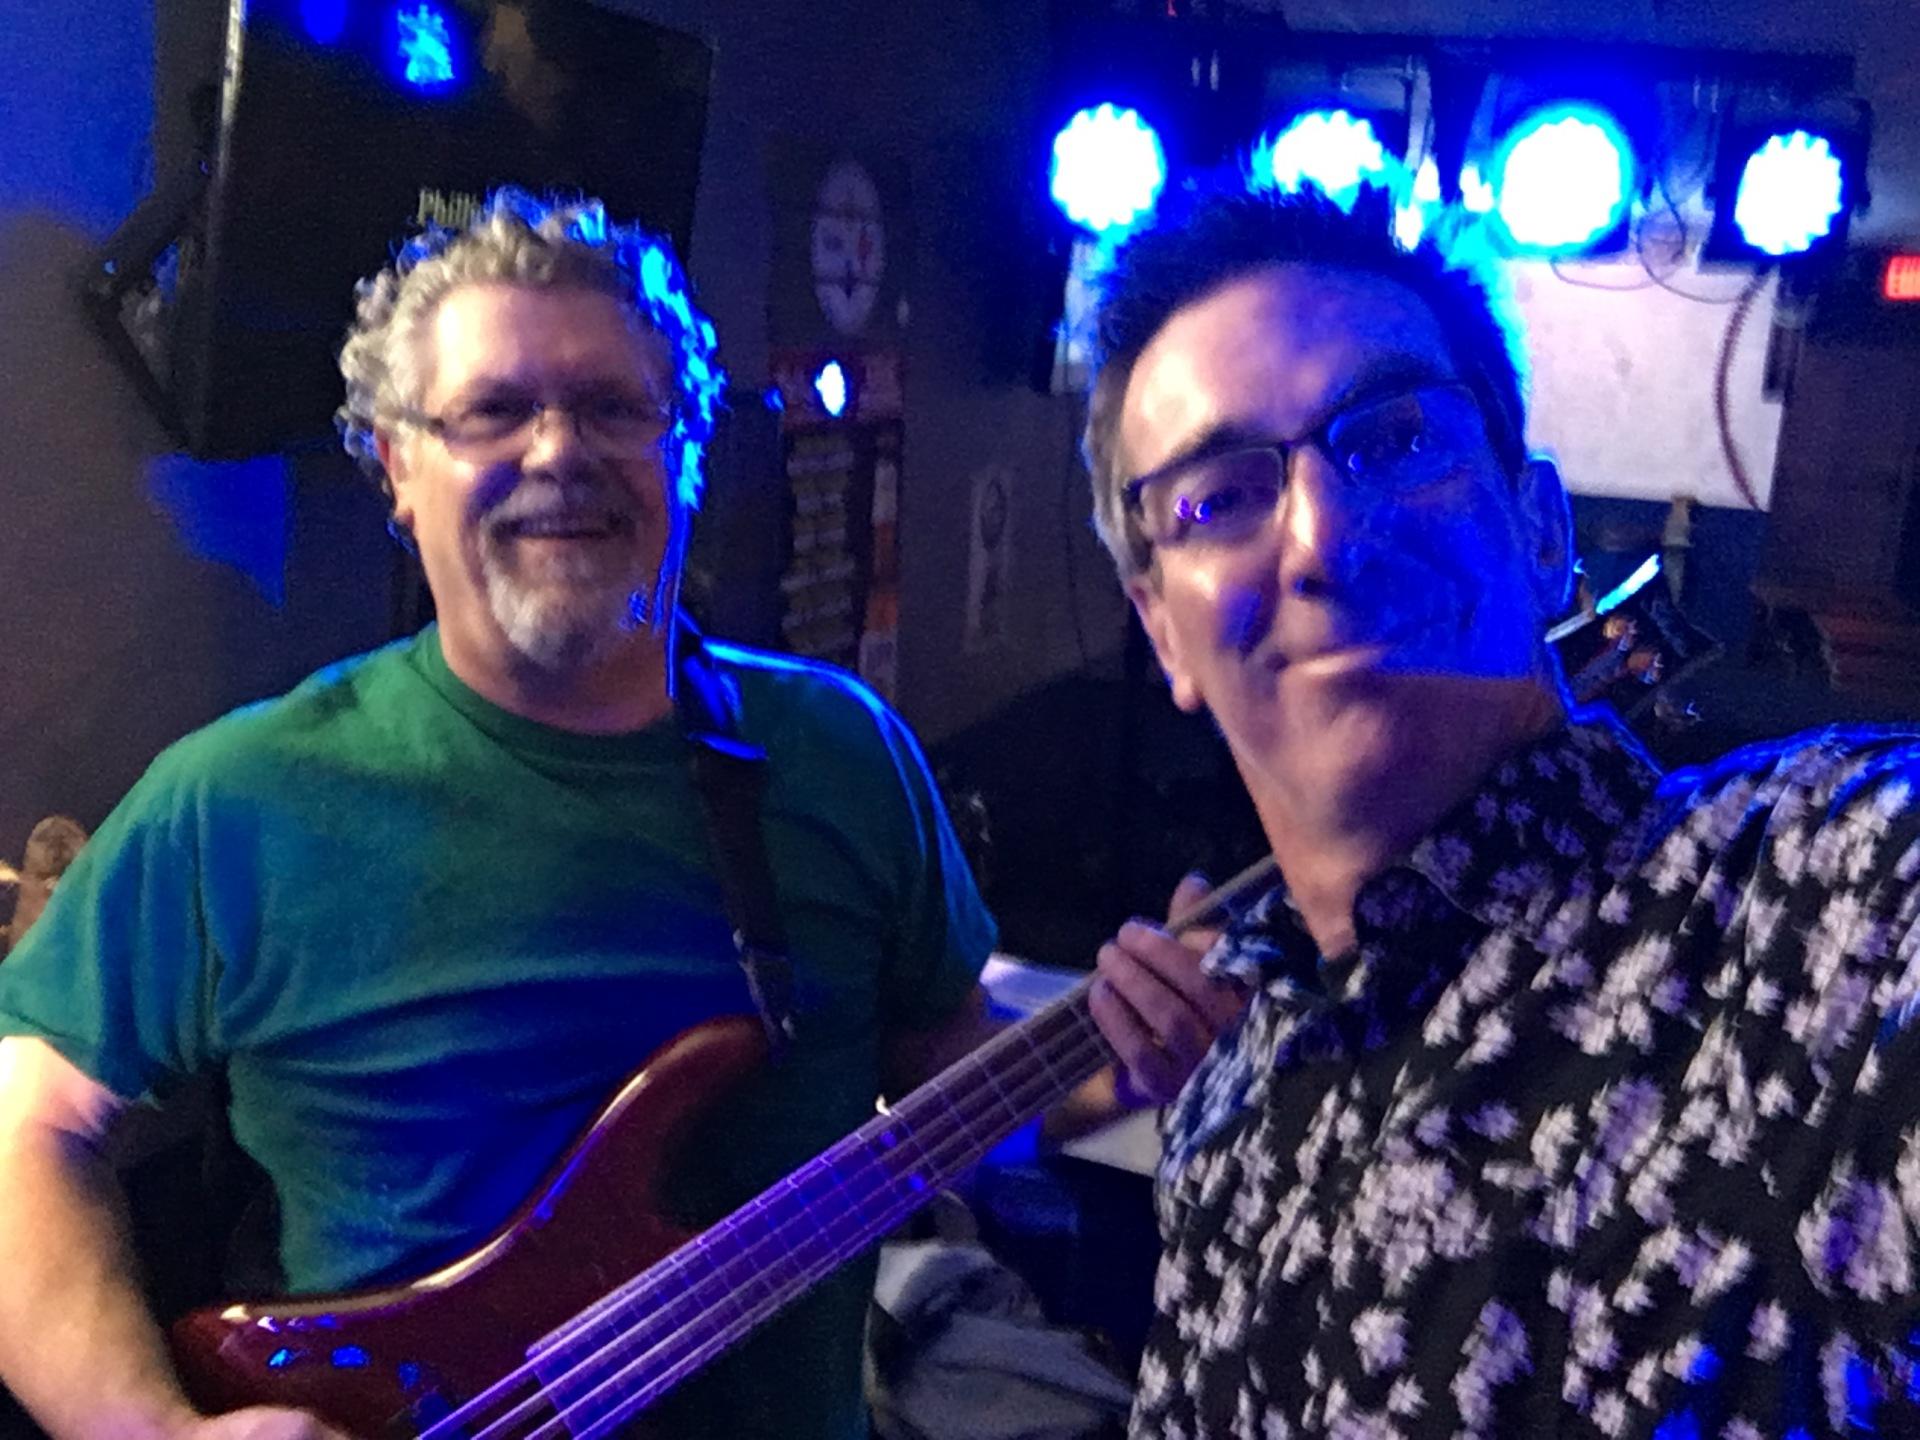 Randy and Scott